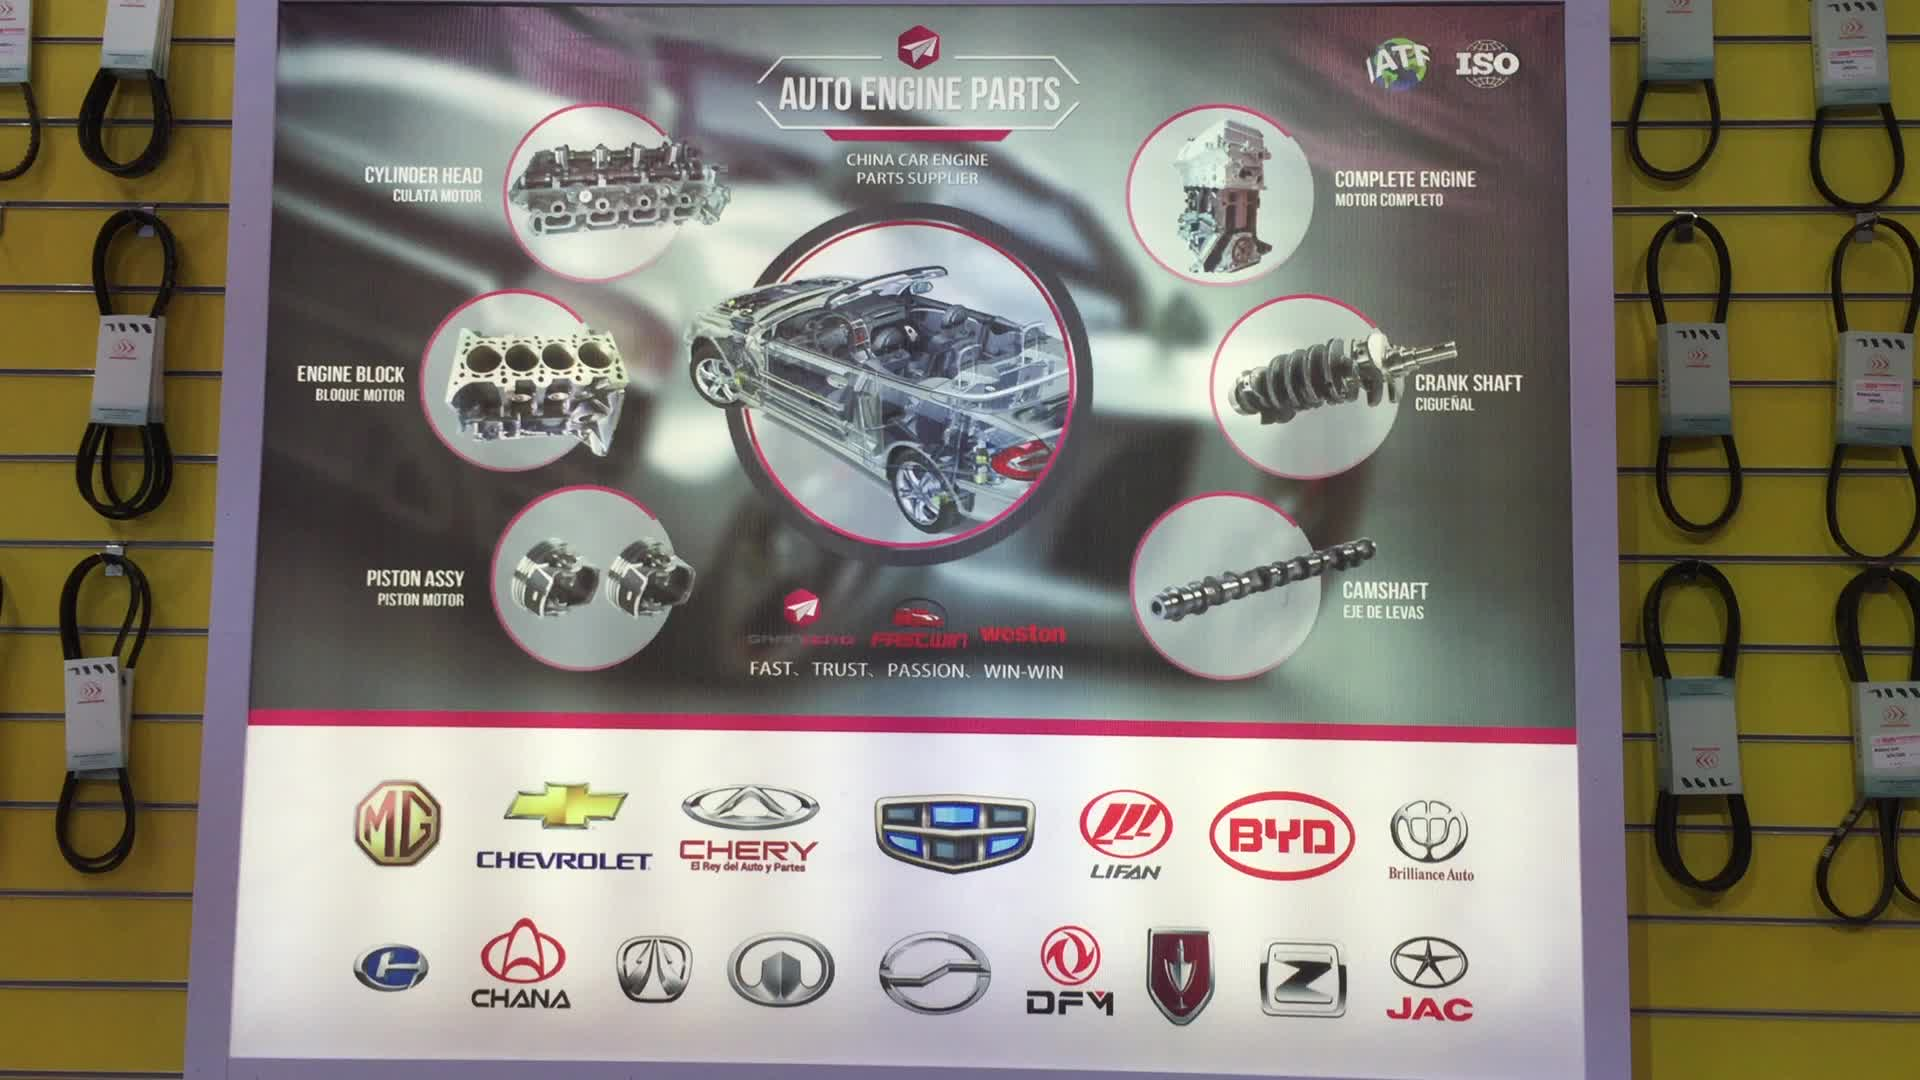 China Car Parts for Chevrolet N300/N200 Van